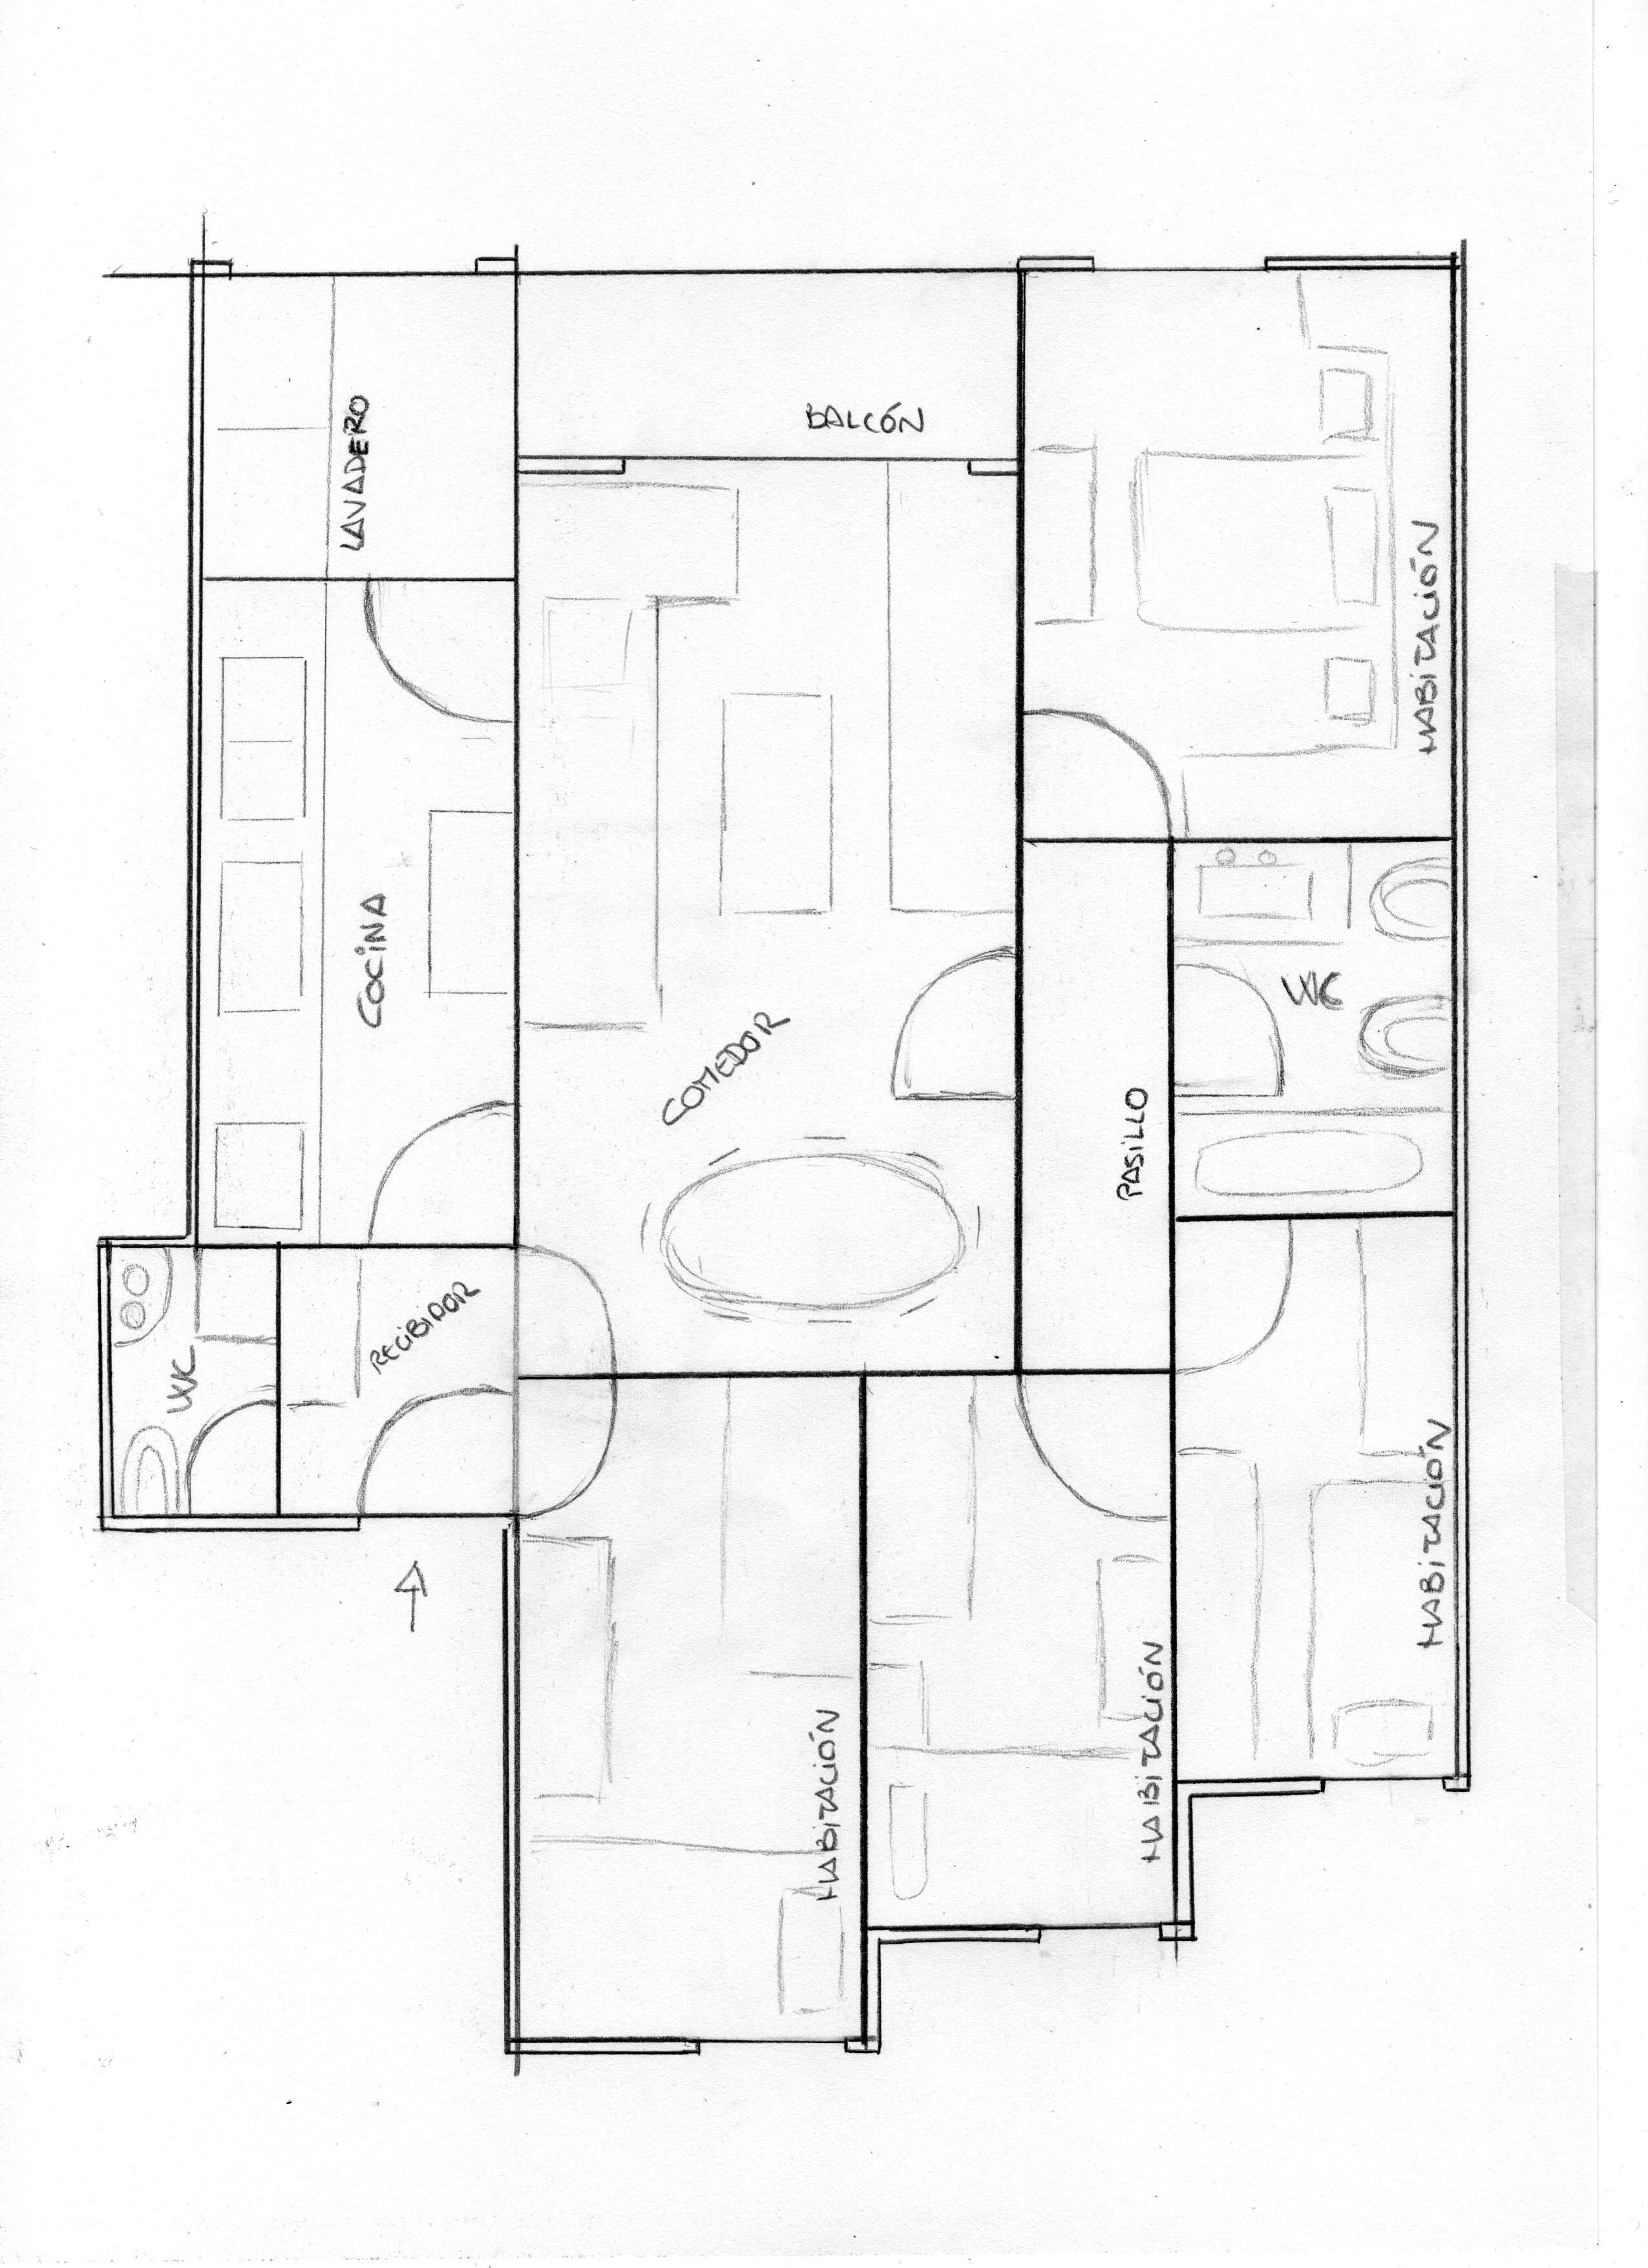 Bagua en piso irregular casa feng shui - Entrada de un piso feng shui ...